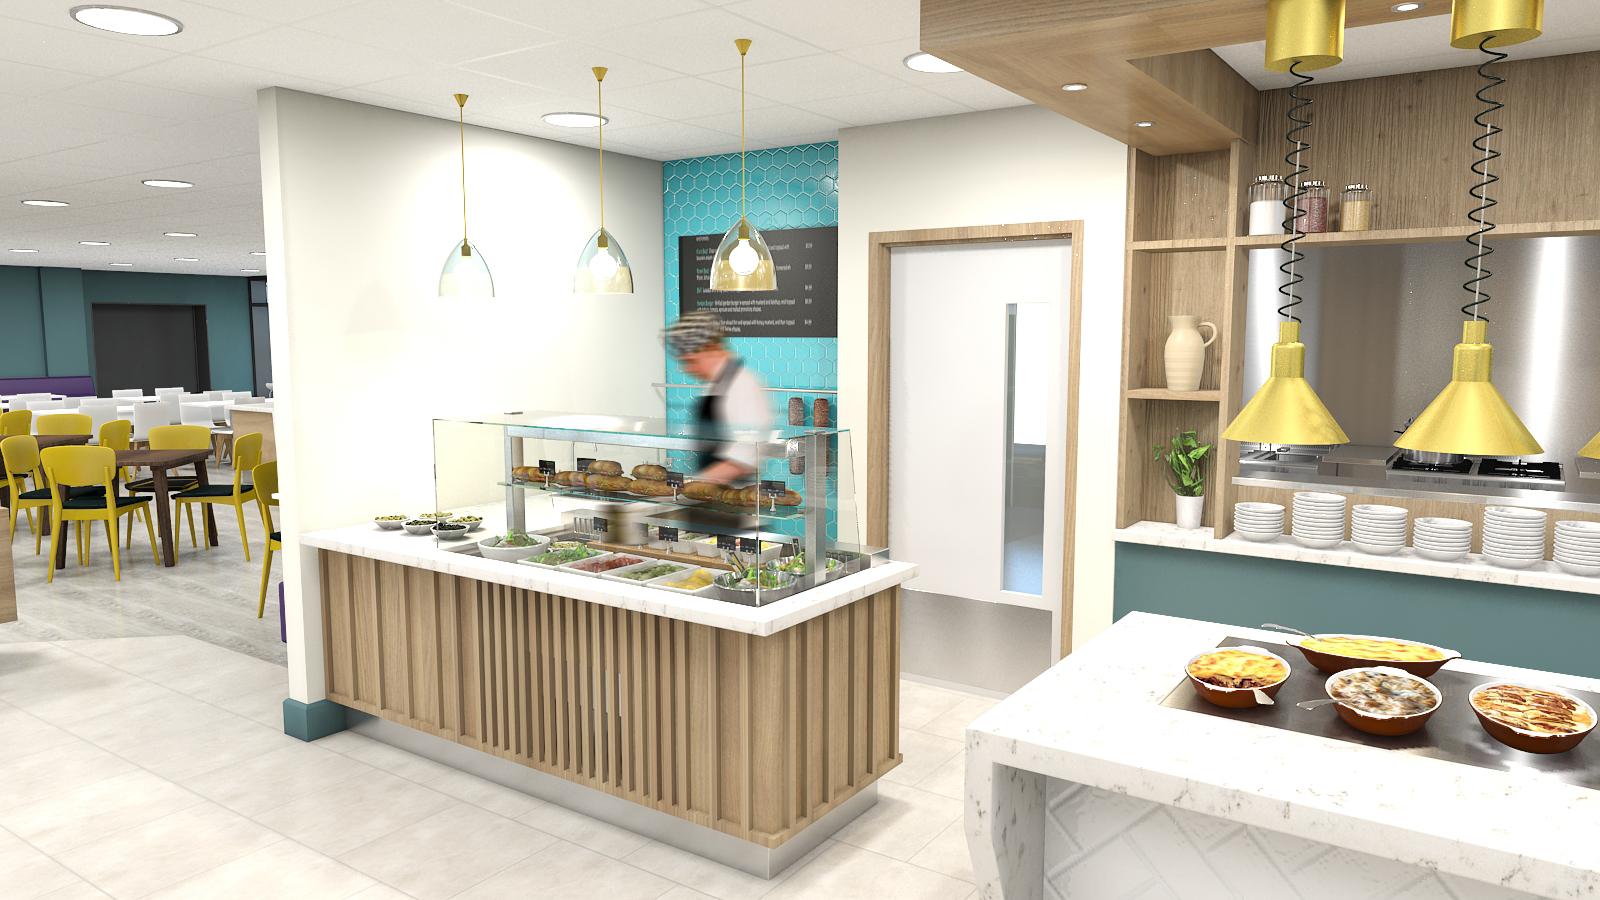 hospitality design, hospitality designer. Deli, interior designer